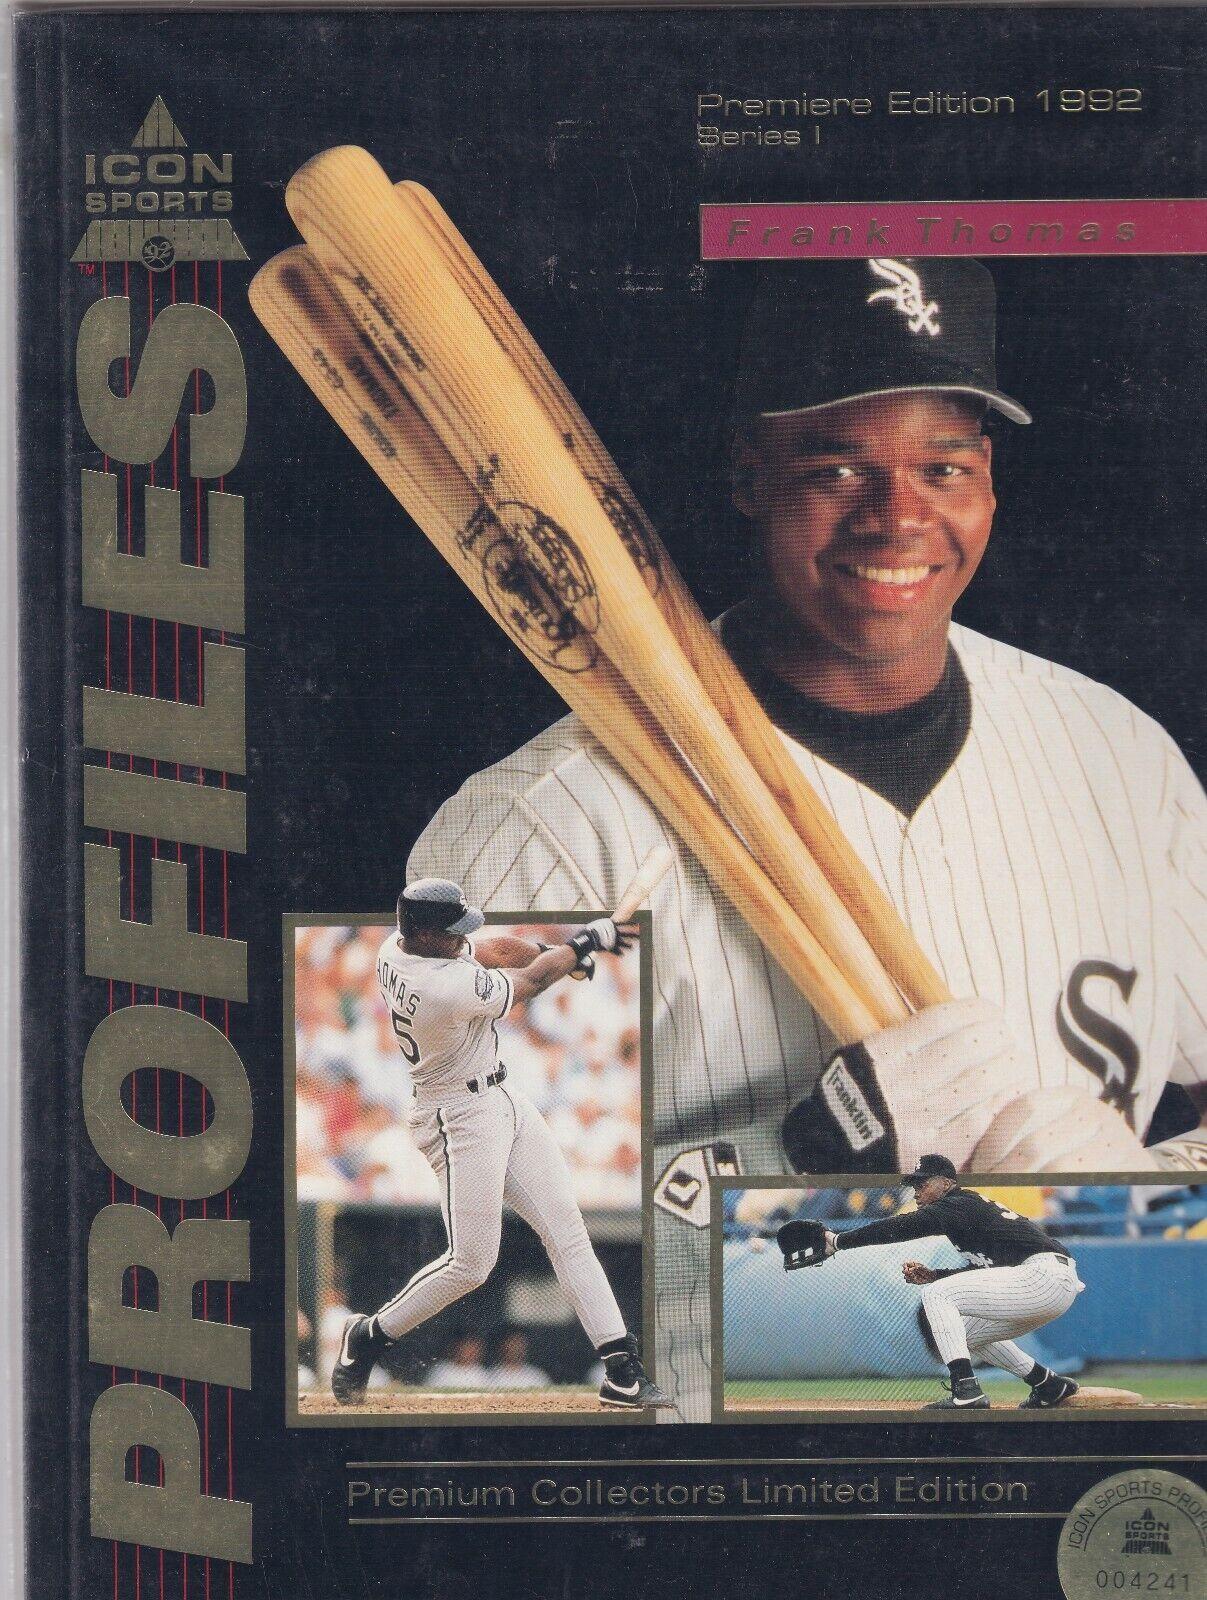 Profiles Icon Sports Mag Frank Thomas Limited Edition 1992 070419nonr - $14.99